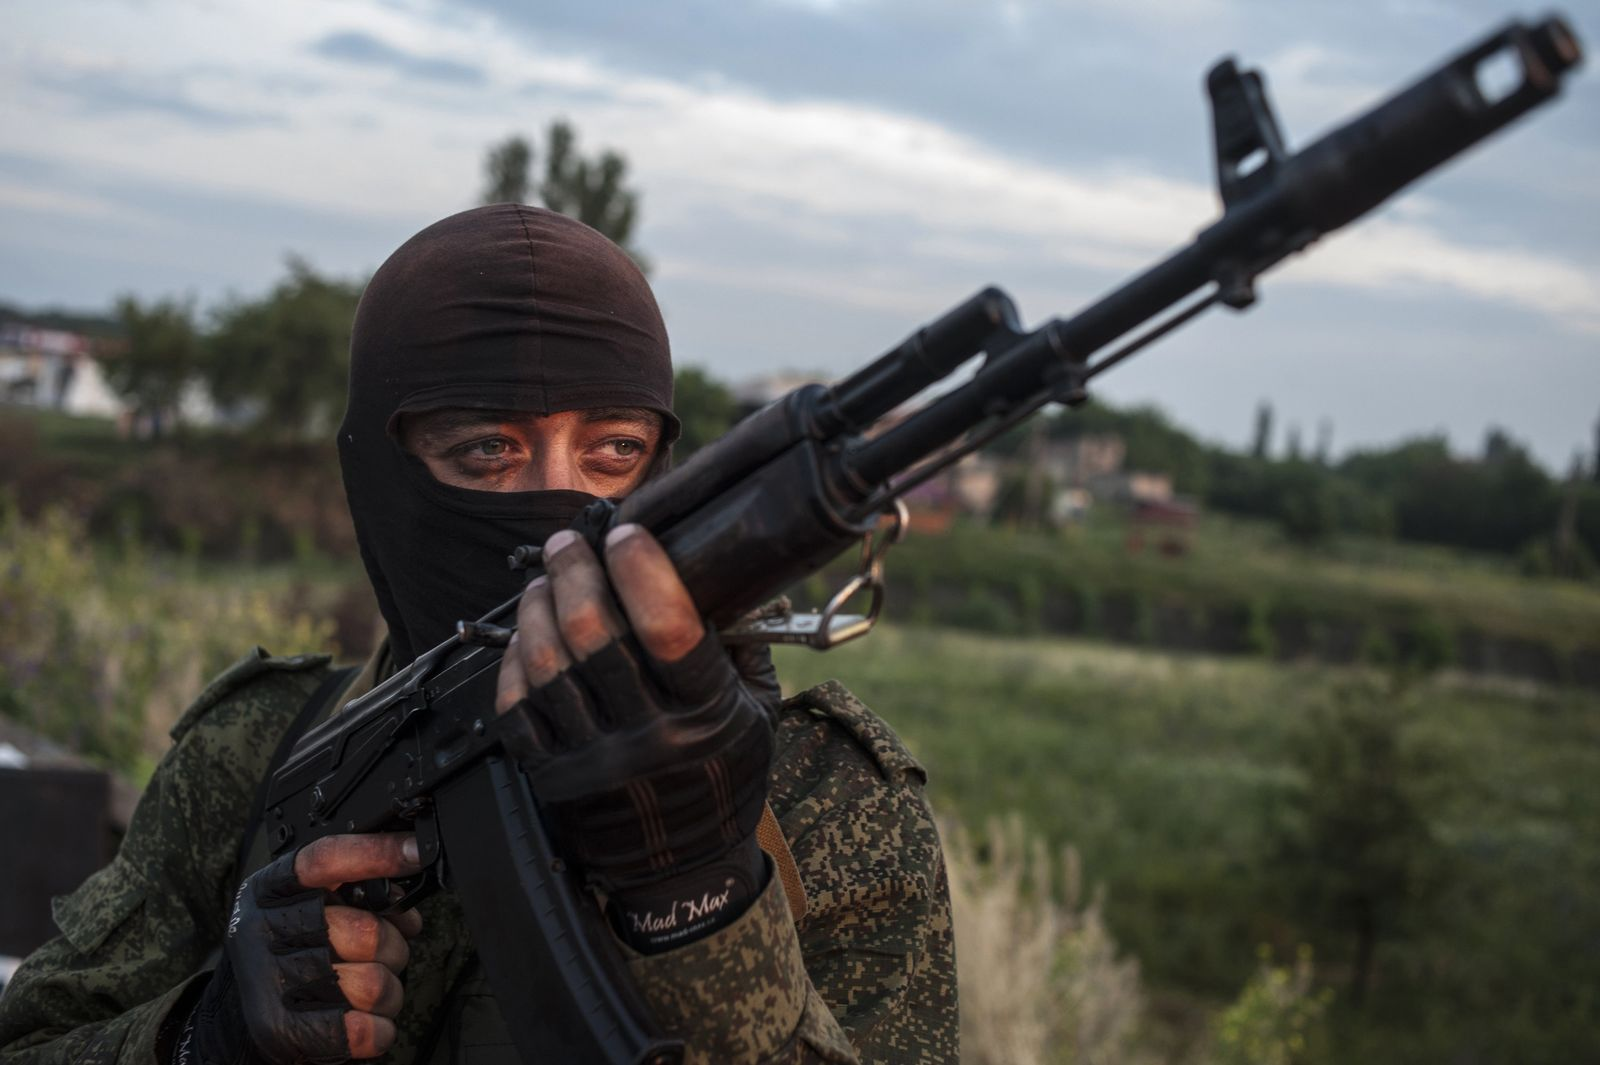 Ukraine/Luhansk